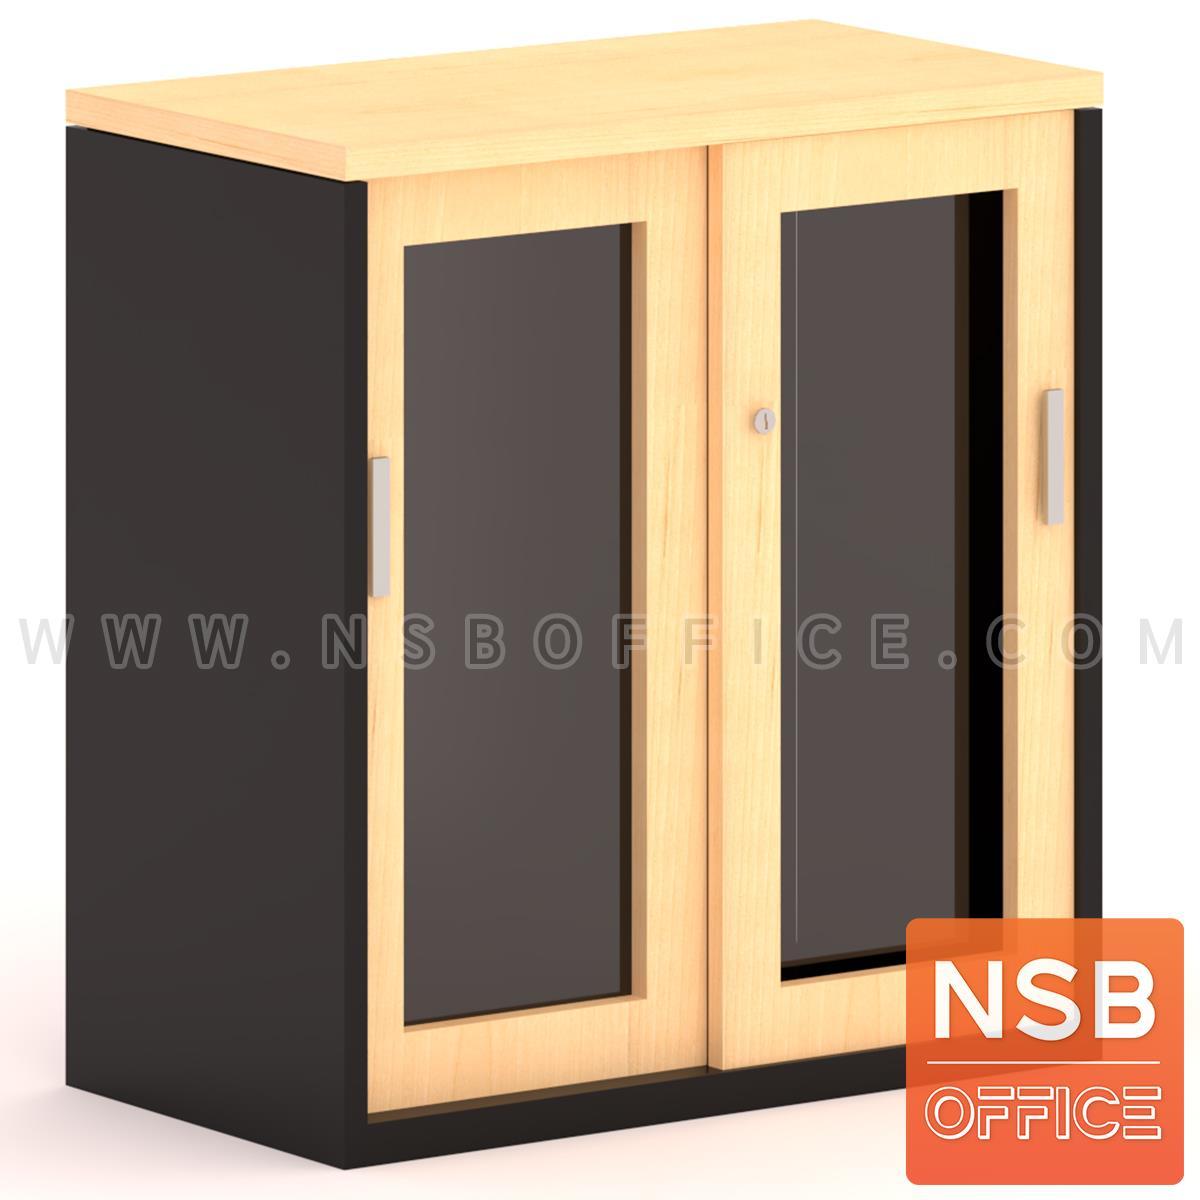 C01A017:ตู้เอกสาร 2 บานเลื่อนกระจก รุ่น Abbey (แอบบีย์) สูง 75 ,80 ,85 cm.  เมลามีน